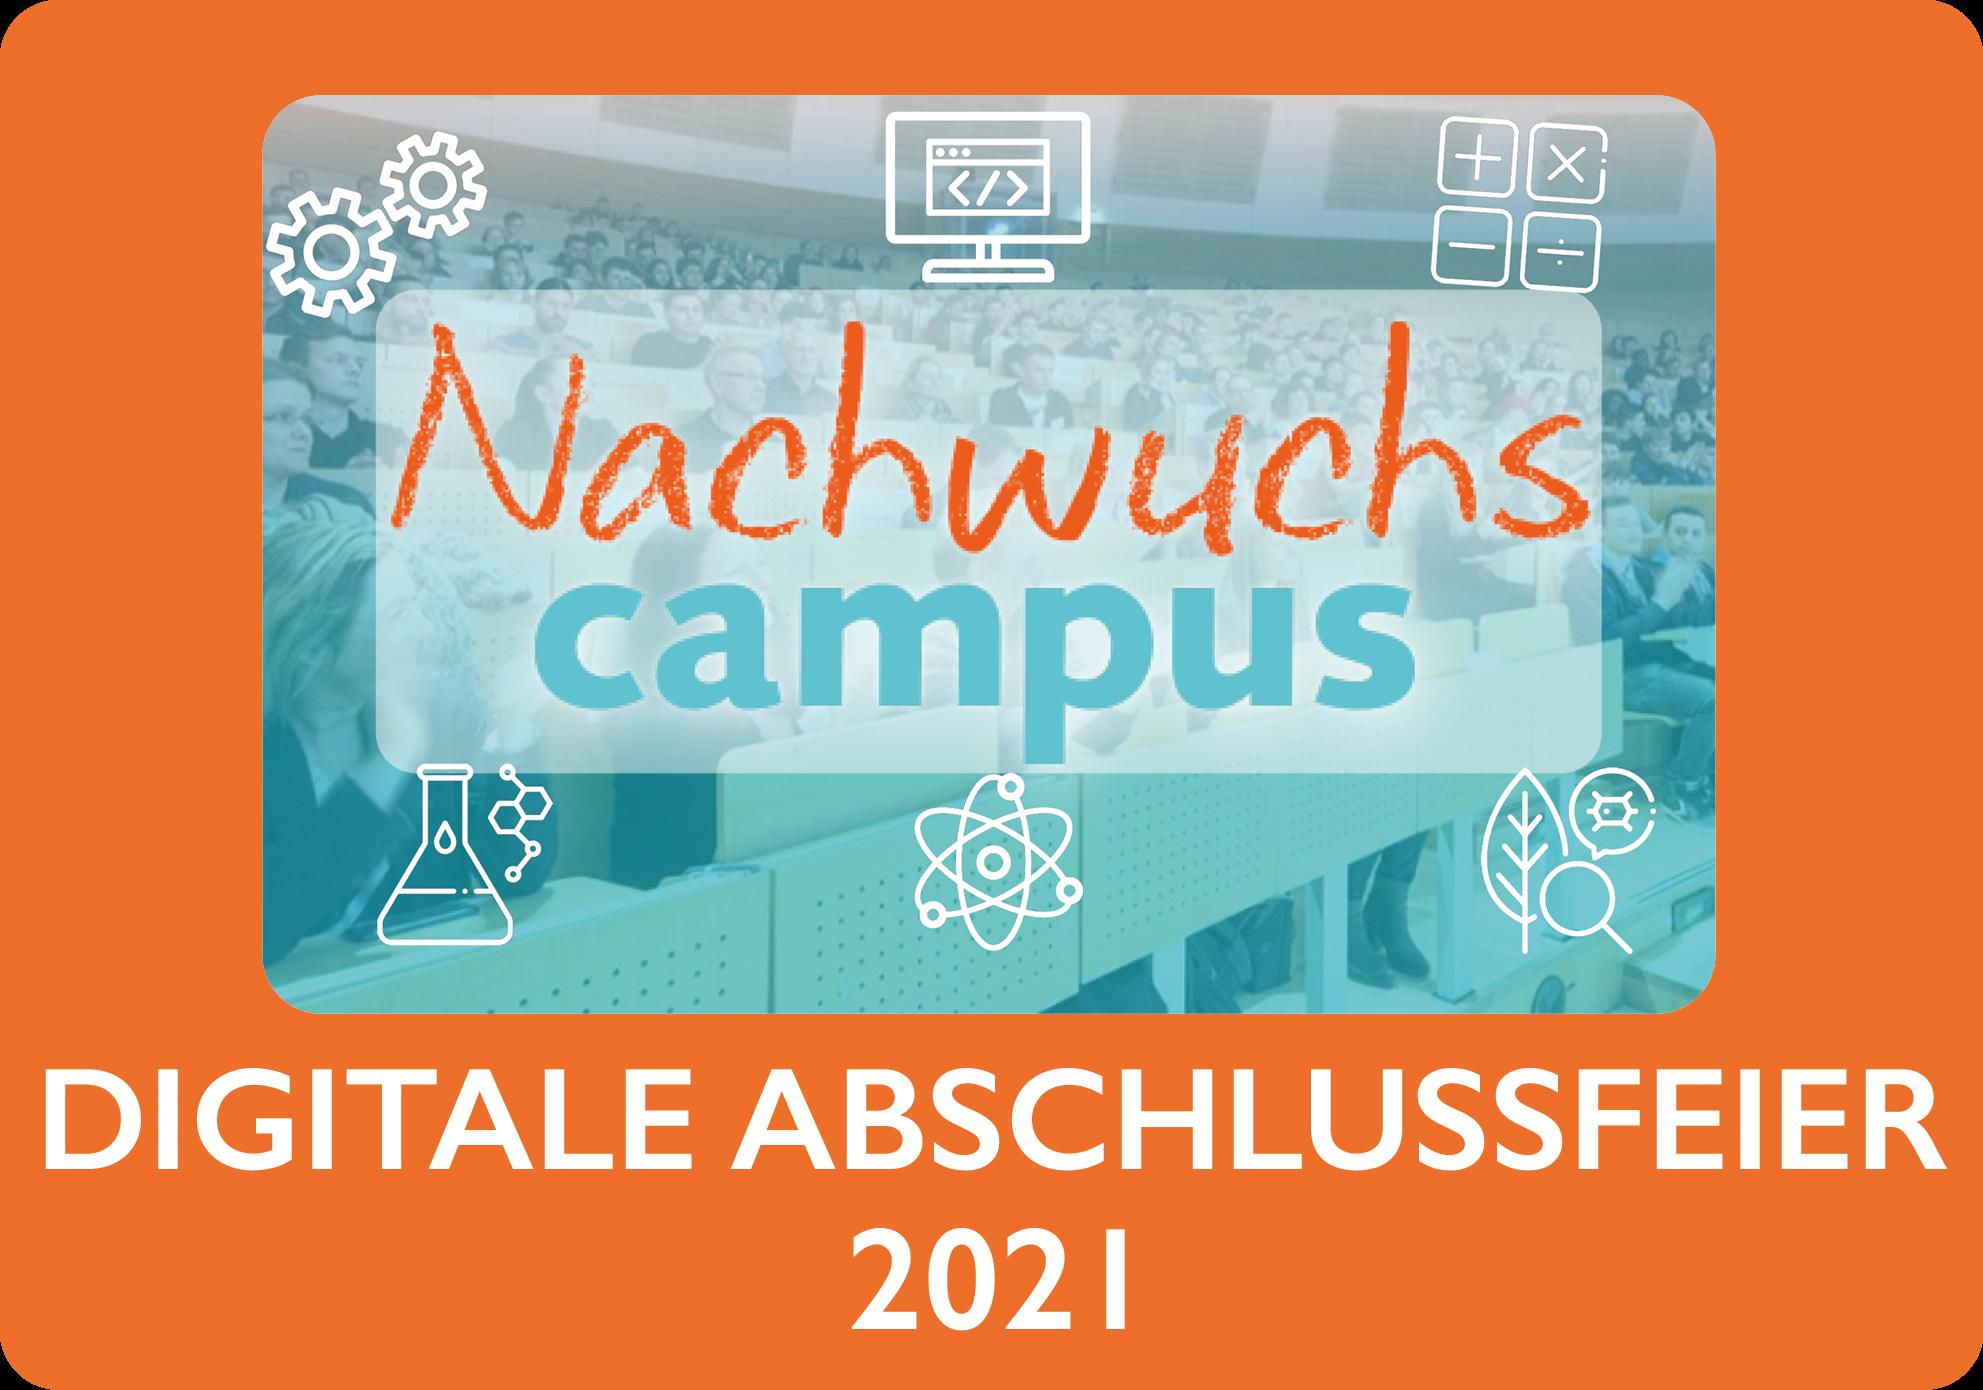 Digitale Abschlussfeier 2021/22